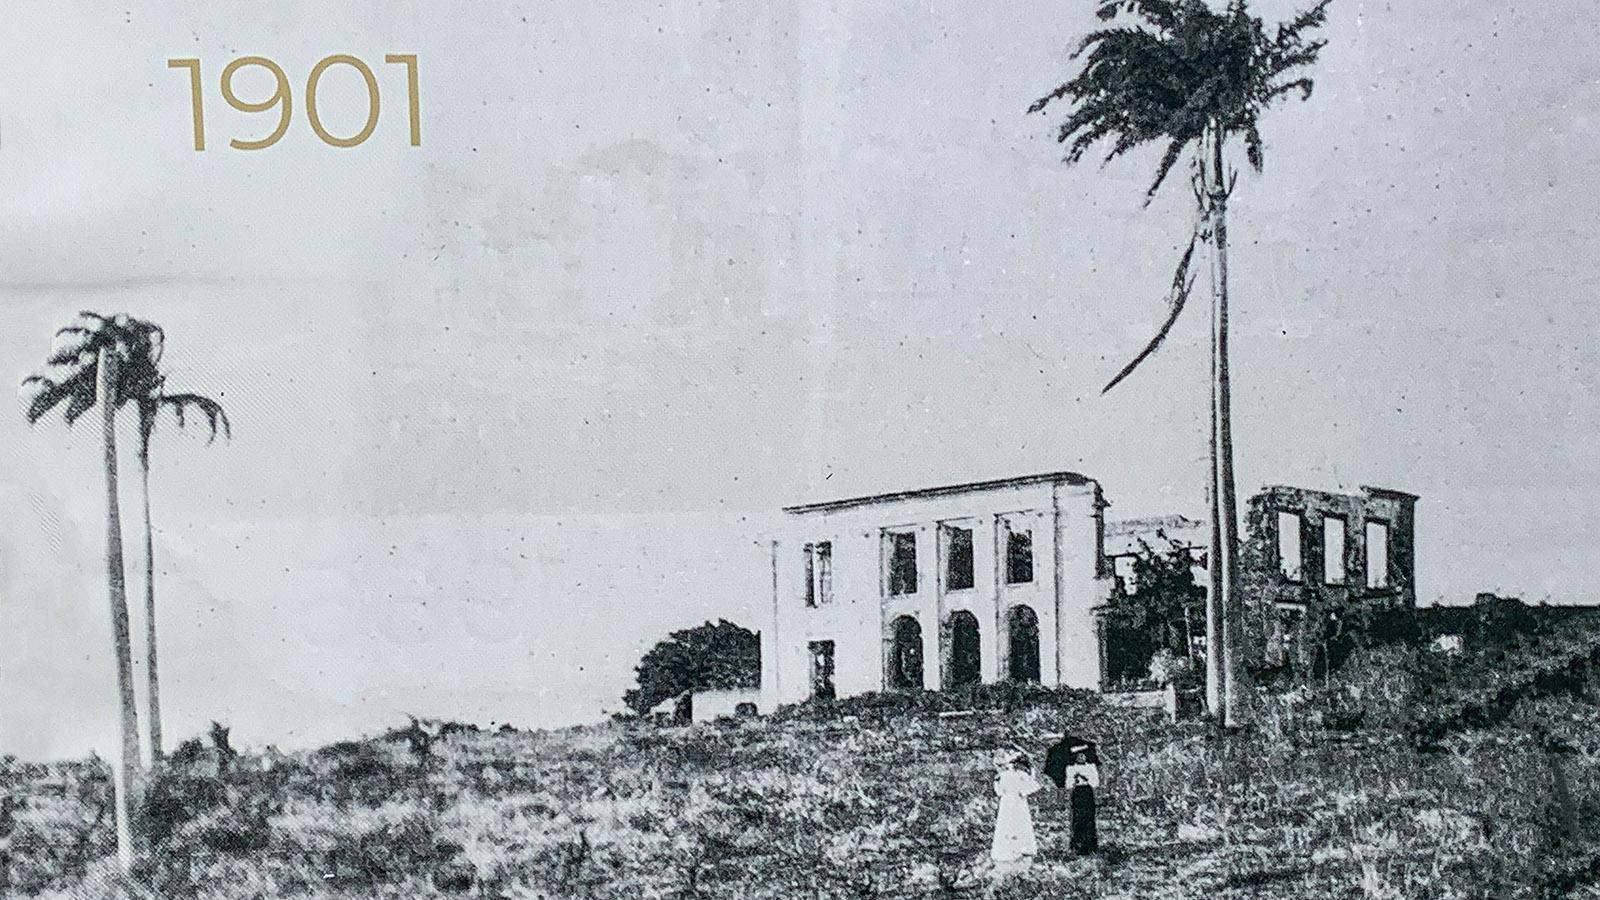 Marie-Gallante: die Habitation Murat 1901. Foto: Hilke Maunder